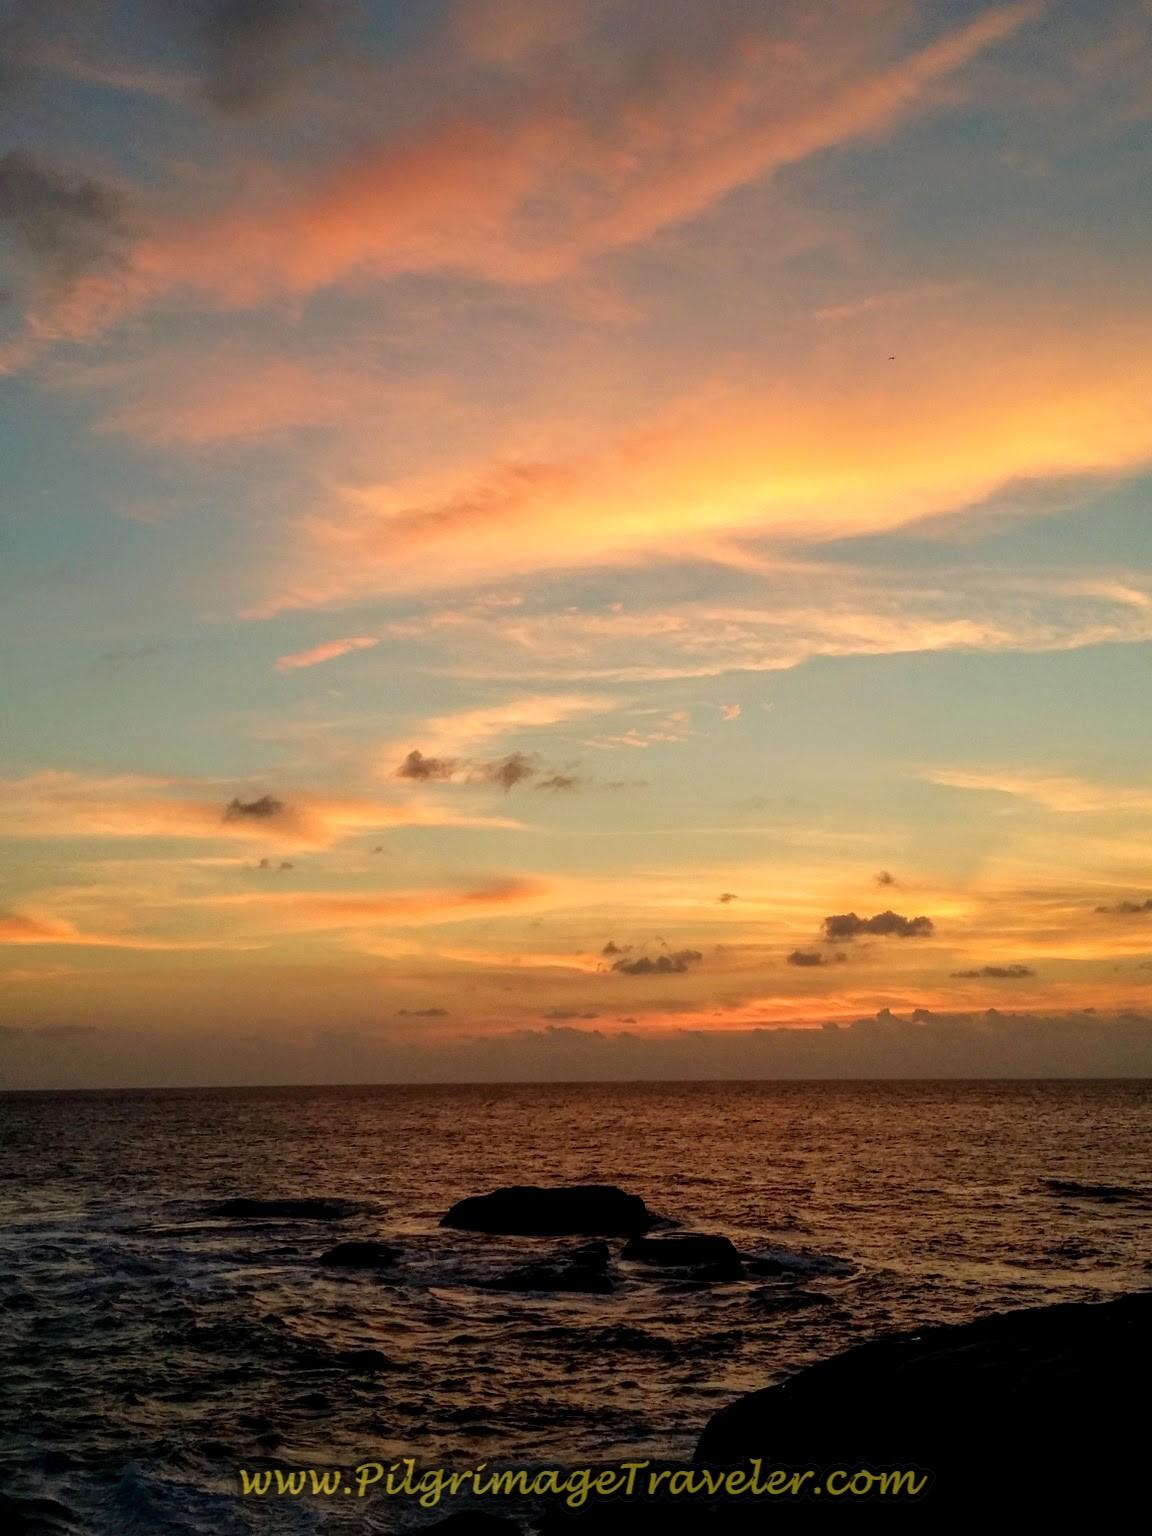 Capturing the Final Moment of the Muxía Costa da Morte Sunset